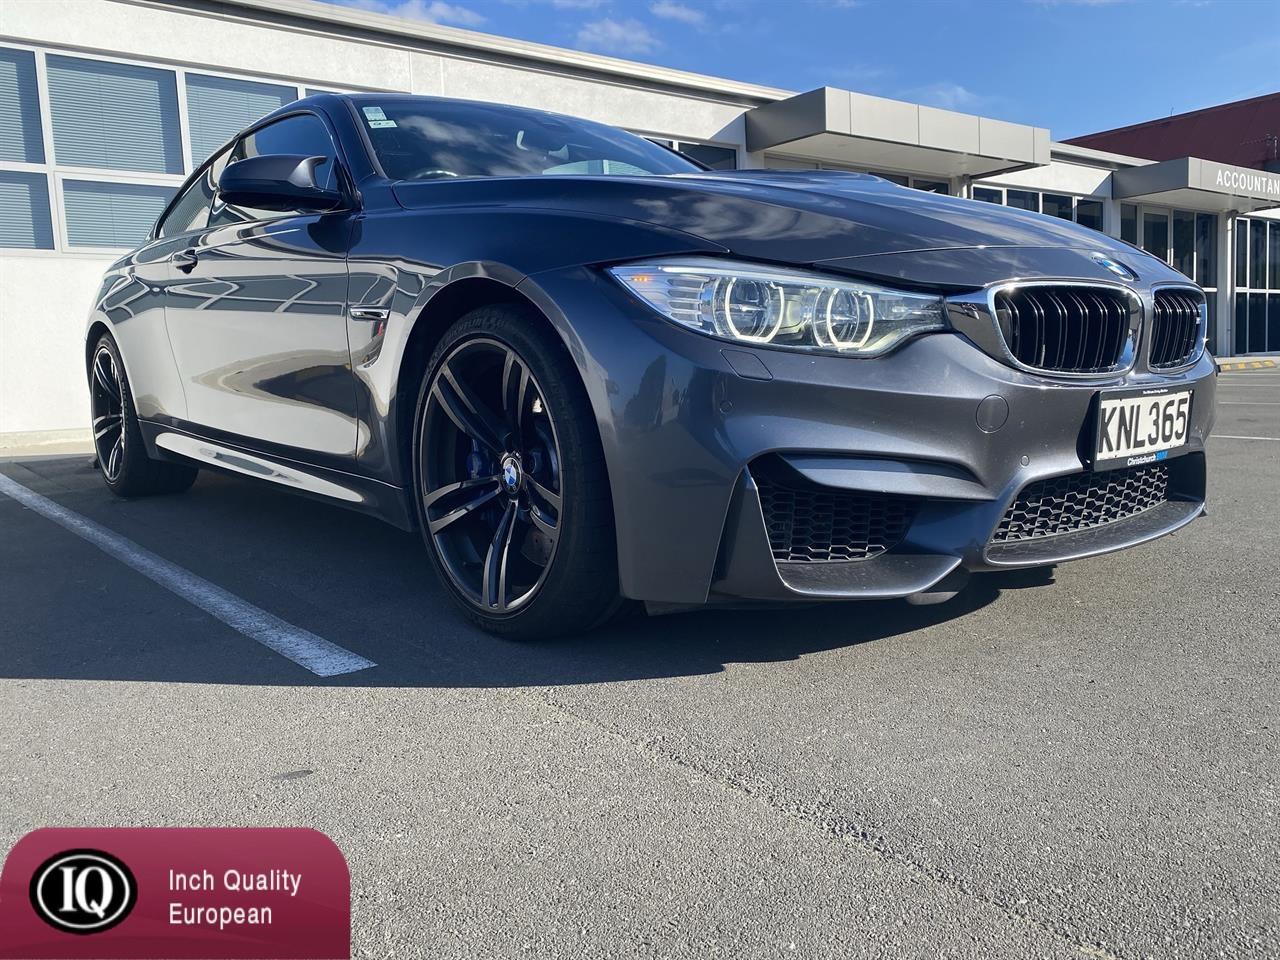 image-0, 2014 BMW M4 at Christchurch